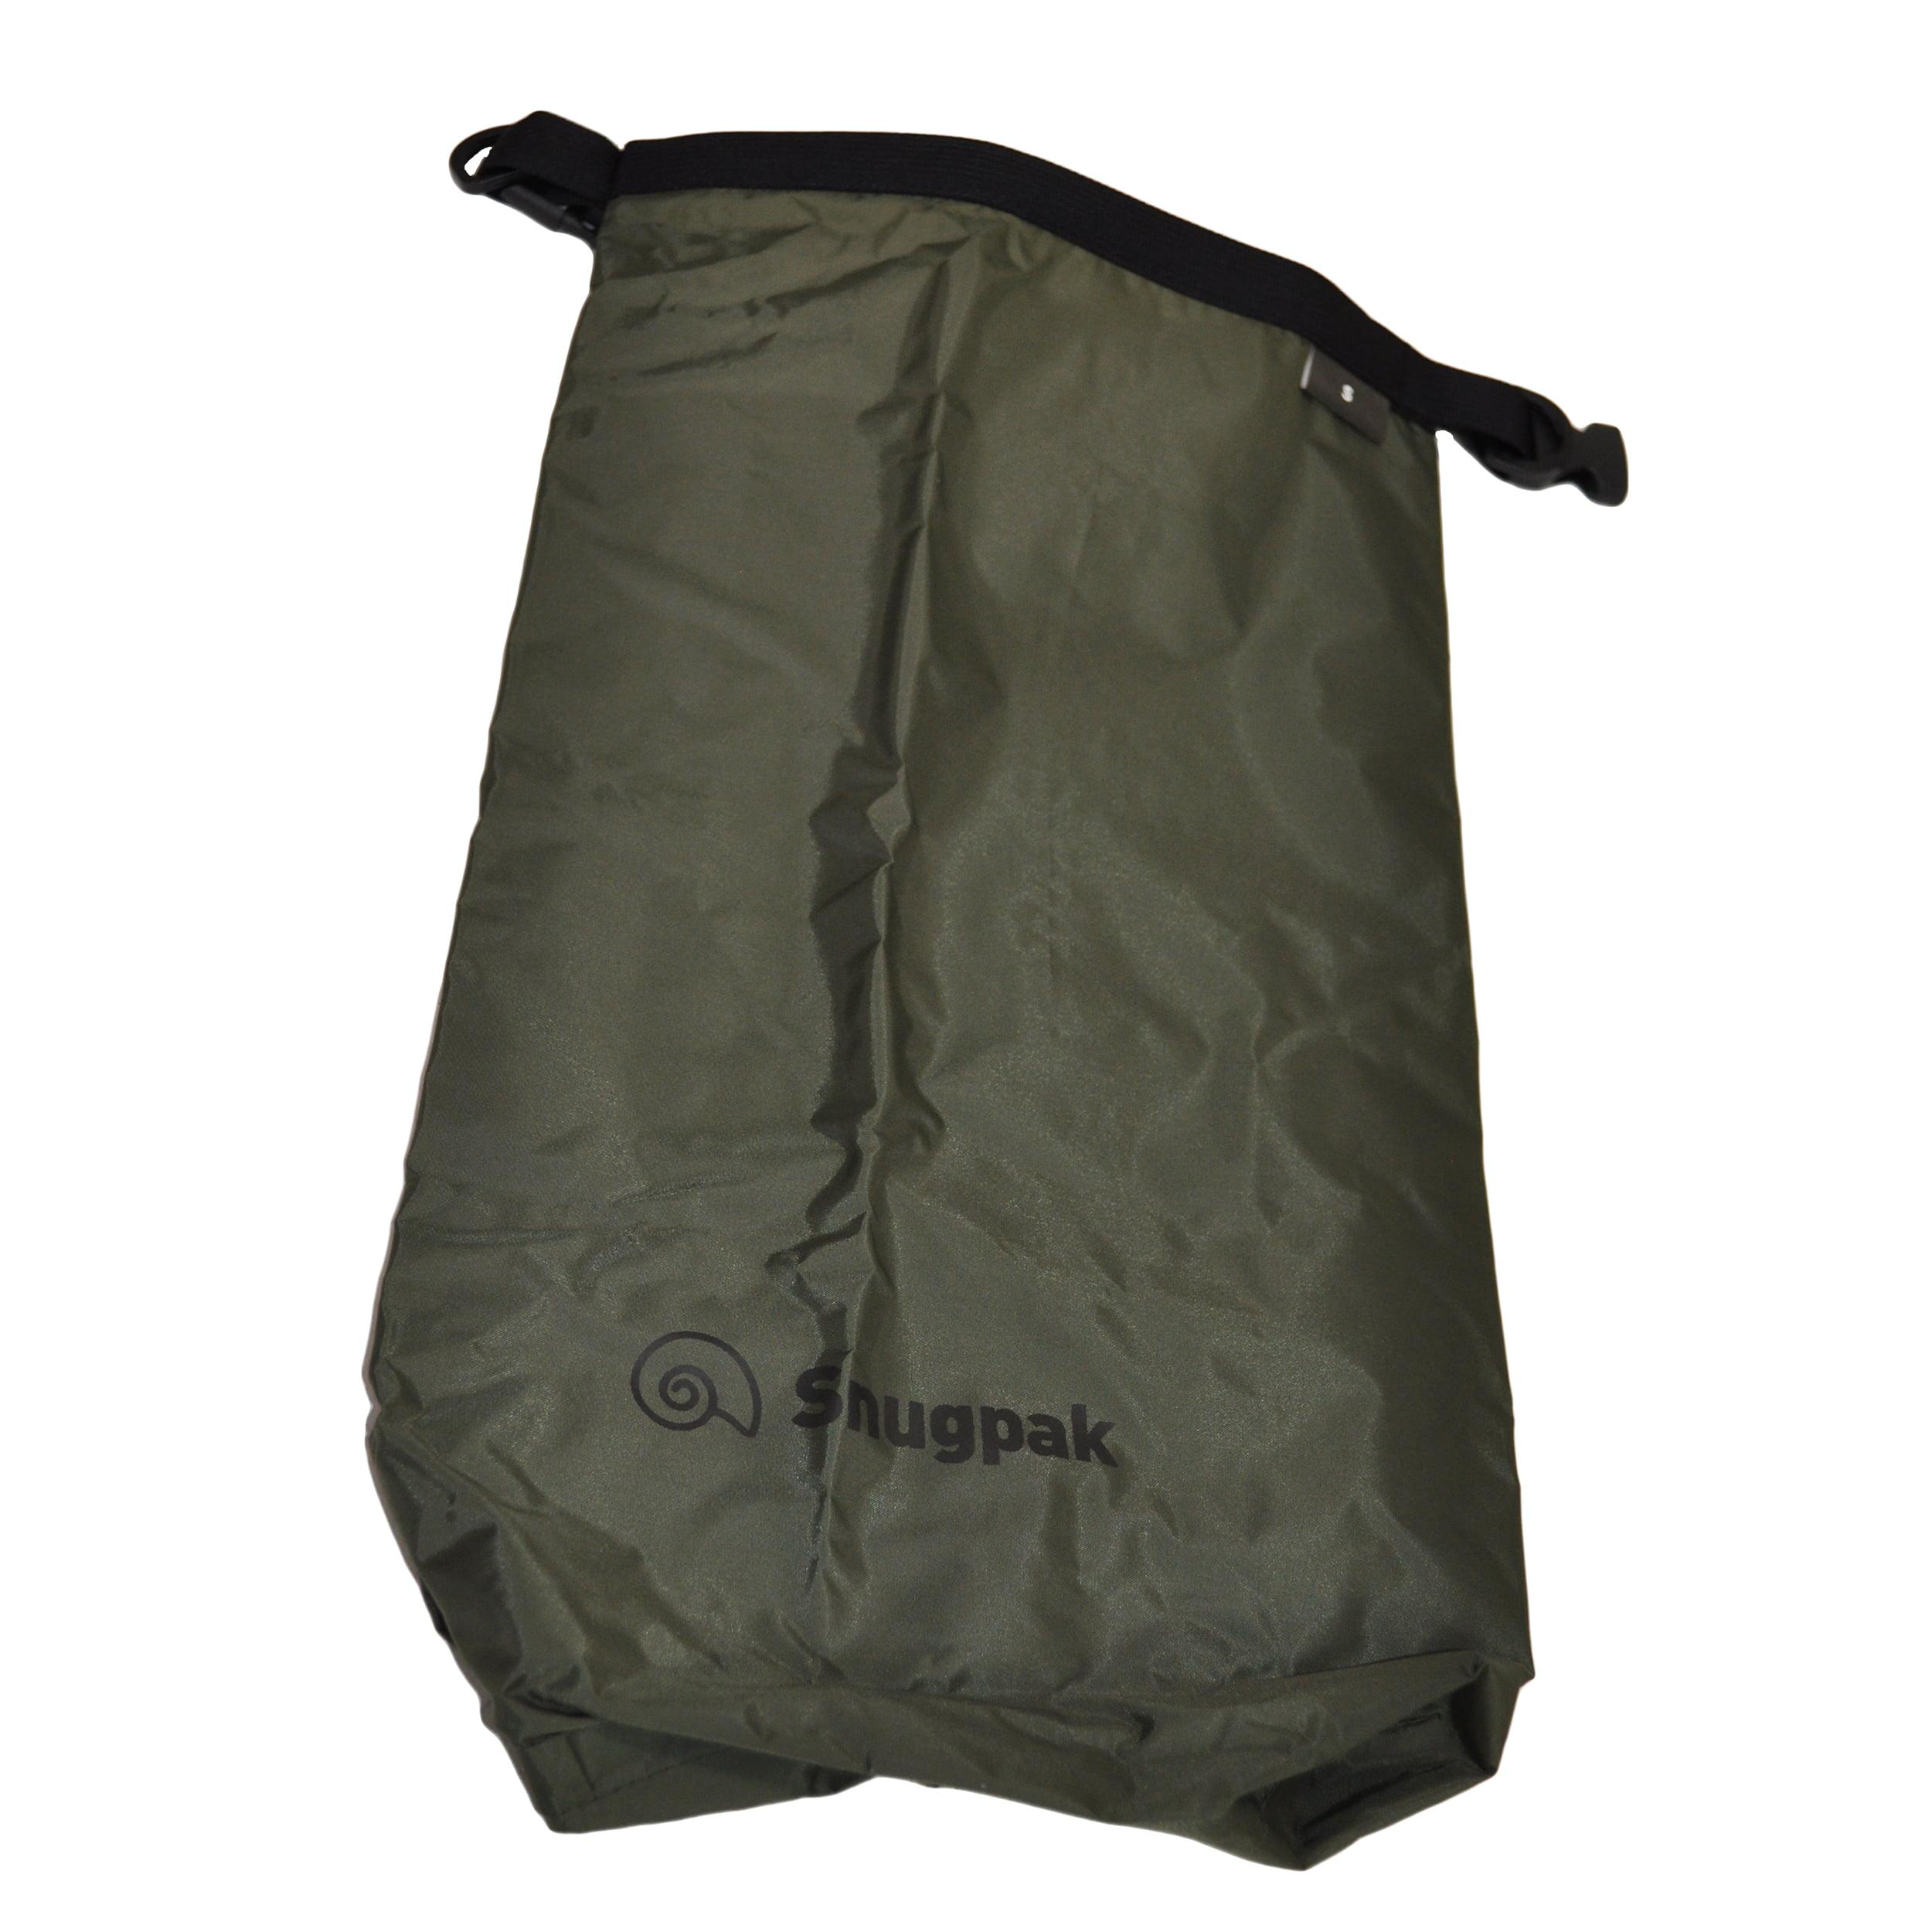 Proforce Equipment Snugpak Dri-sak Original Small, Olive